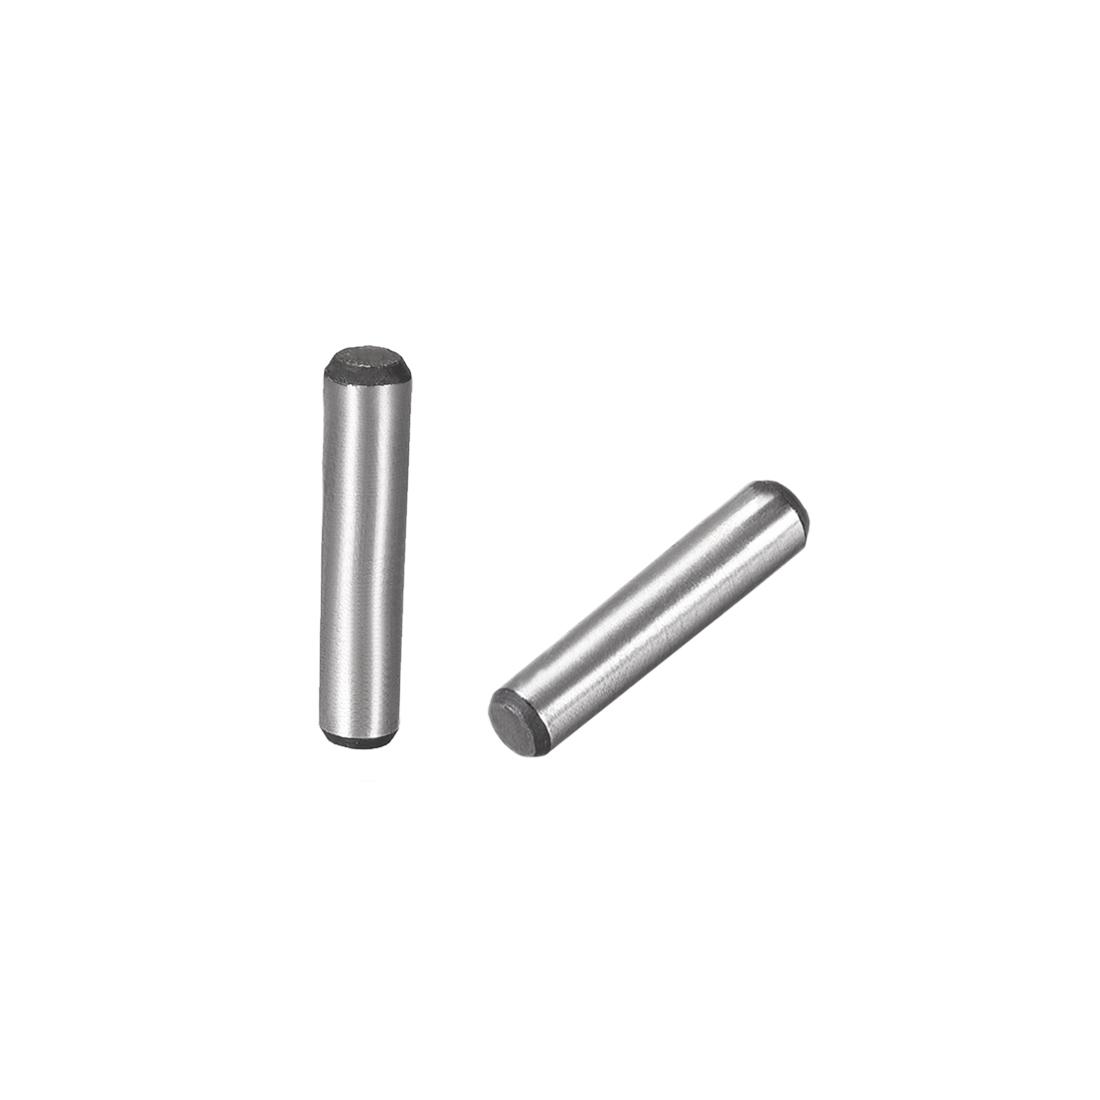 Carbon Steel GB117 25mm Length 5mmx5.5mm Small End Diameter 1:50 Taper Pin 10Pcs